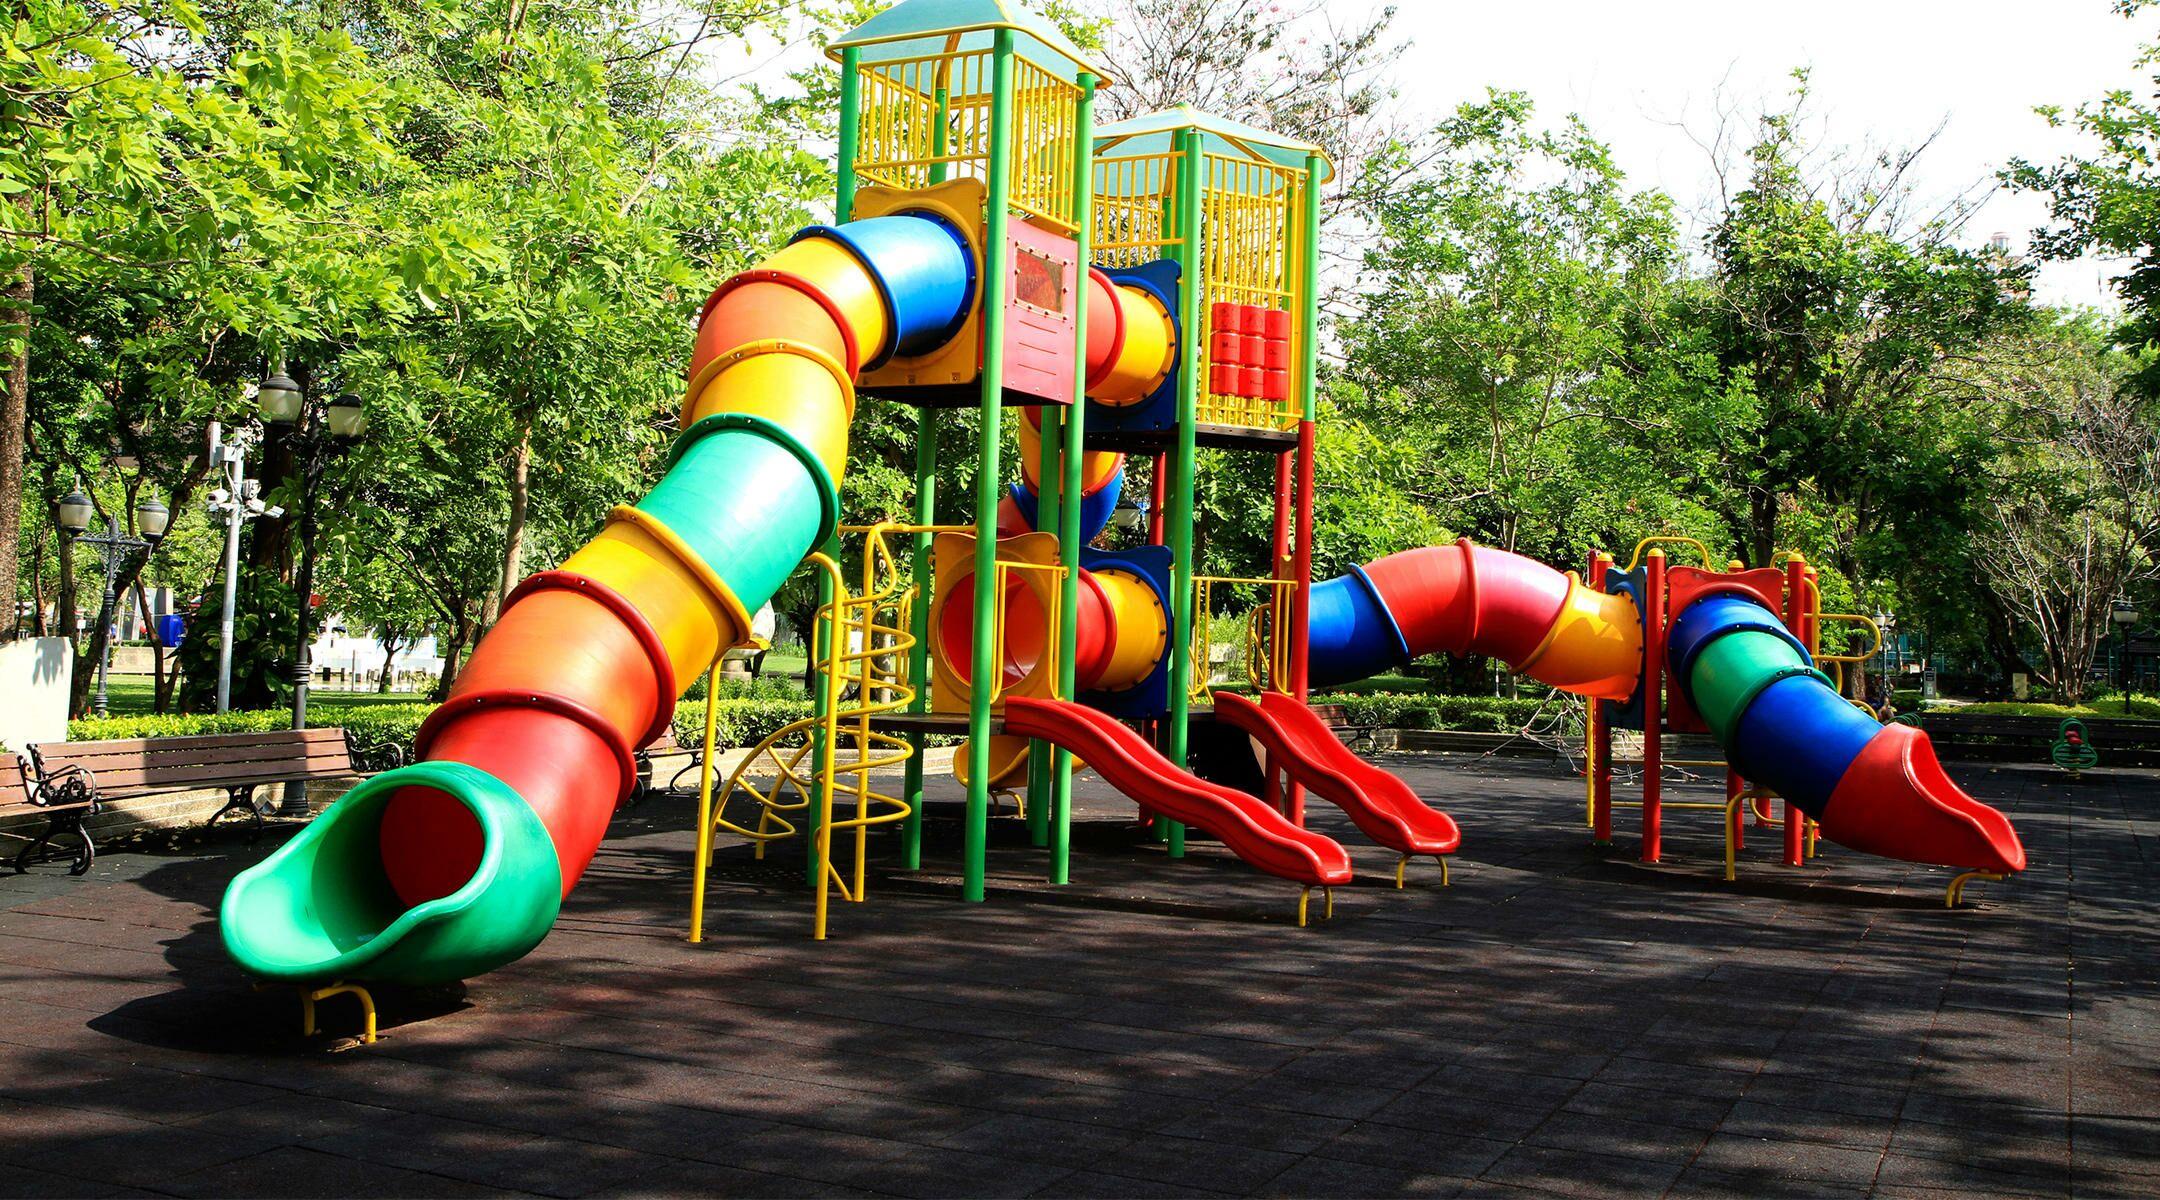 Twin Toddler Playground Safety?